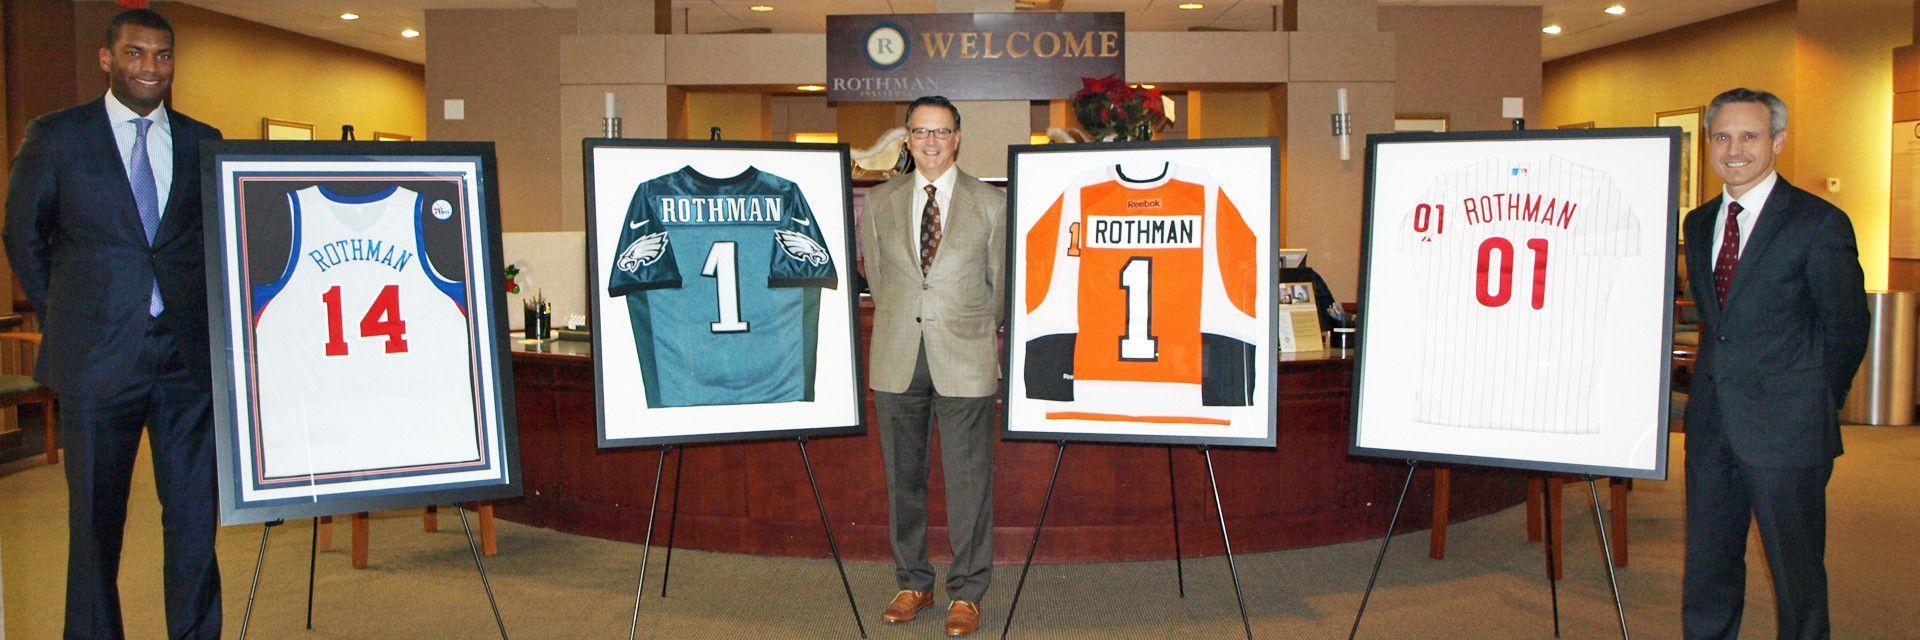 Sports Medicine Fellowship | Rothman Orthopaedic Institute